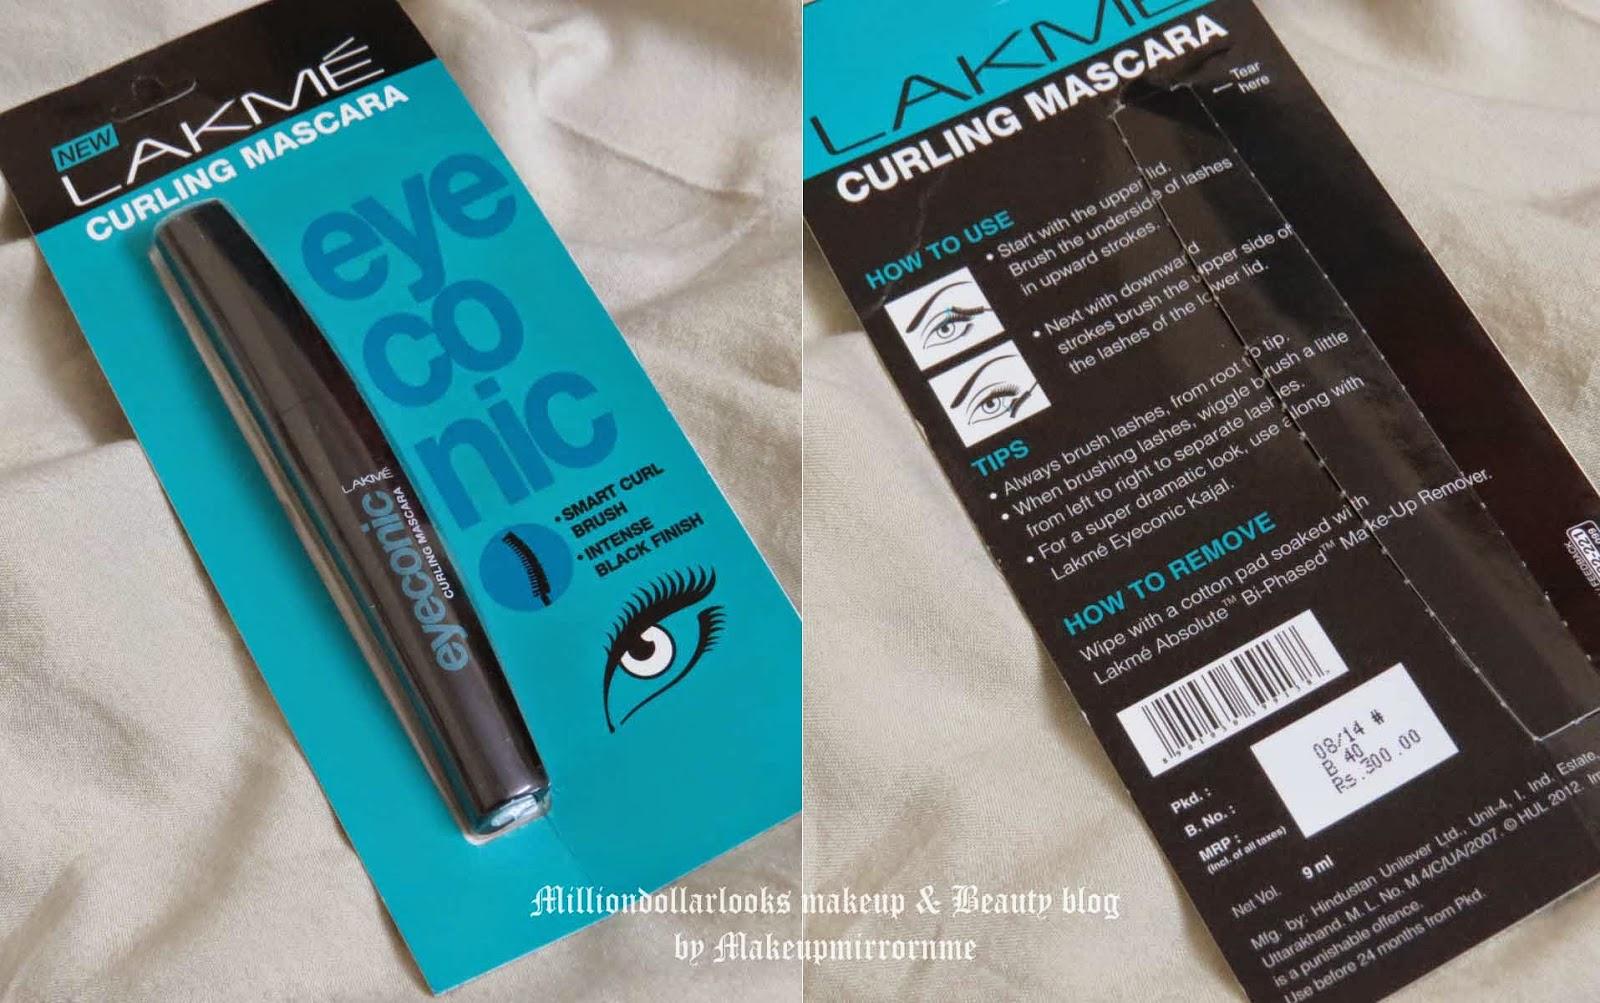 Lakme Eye Liner Lakme Kajal Lakme Mascara photos